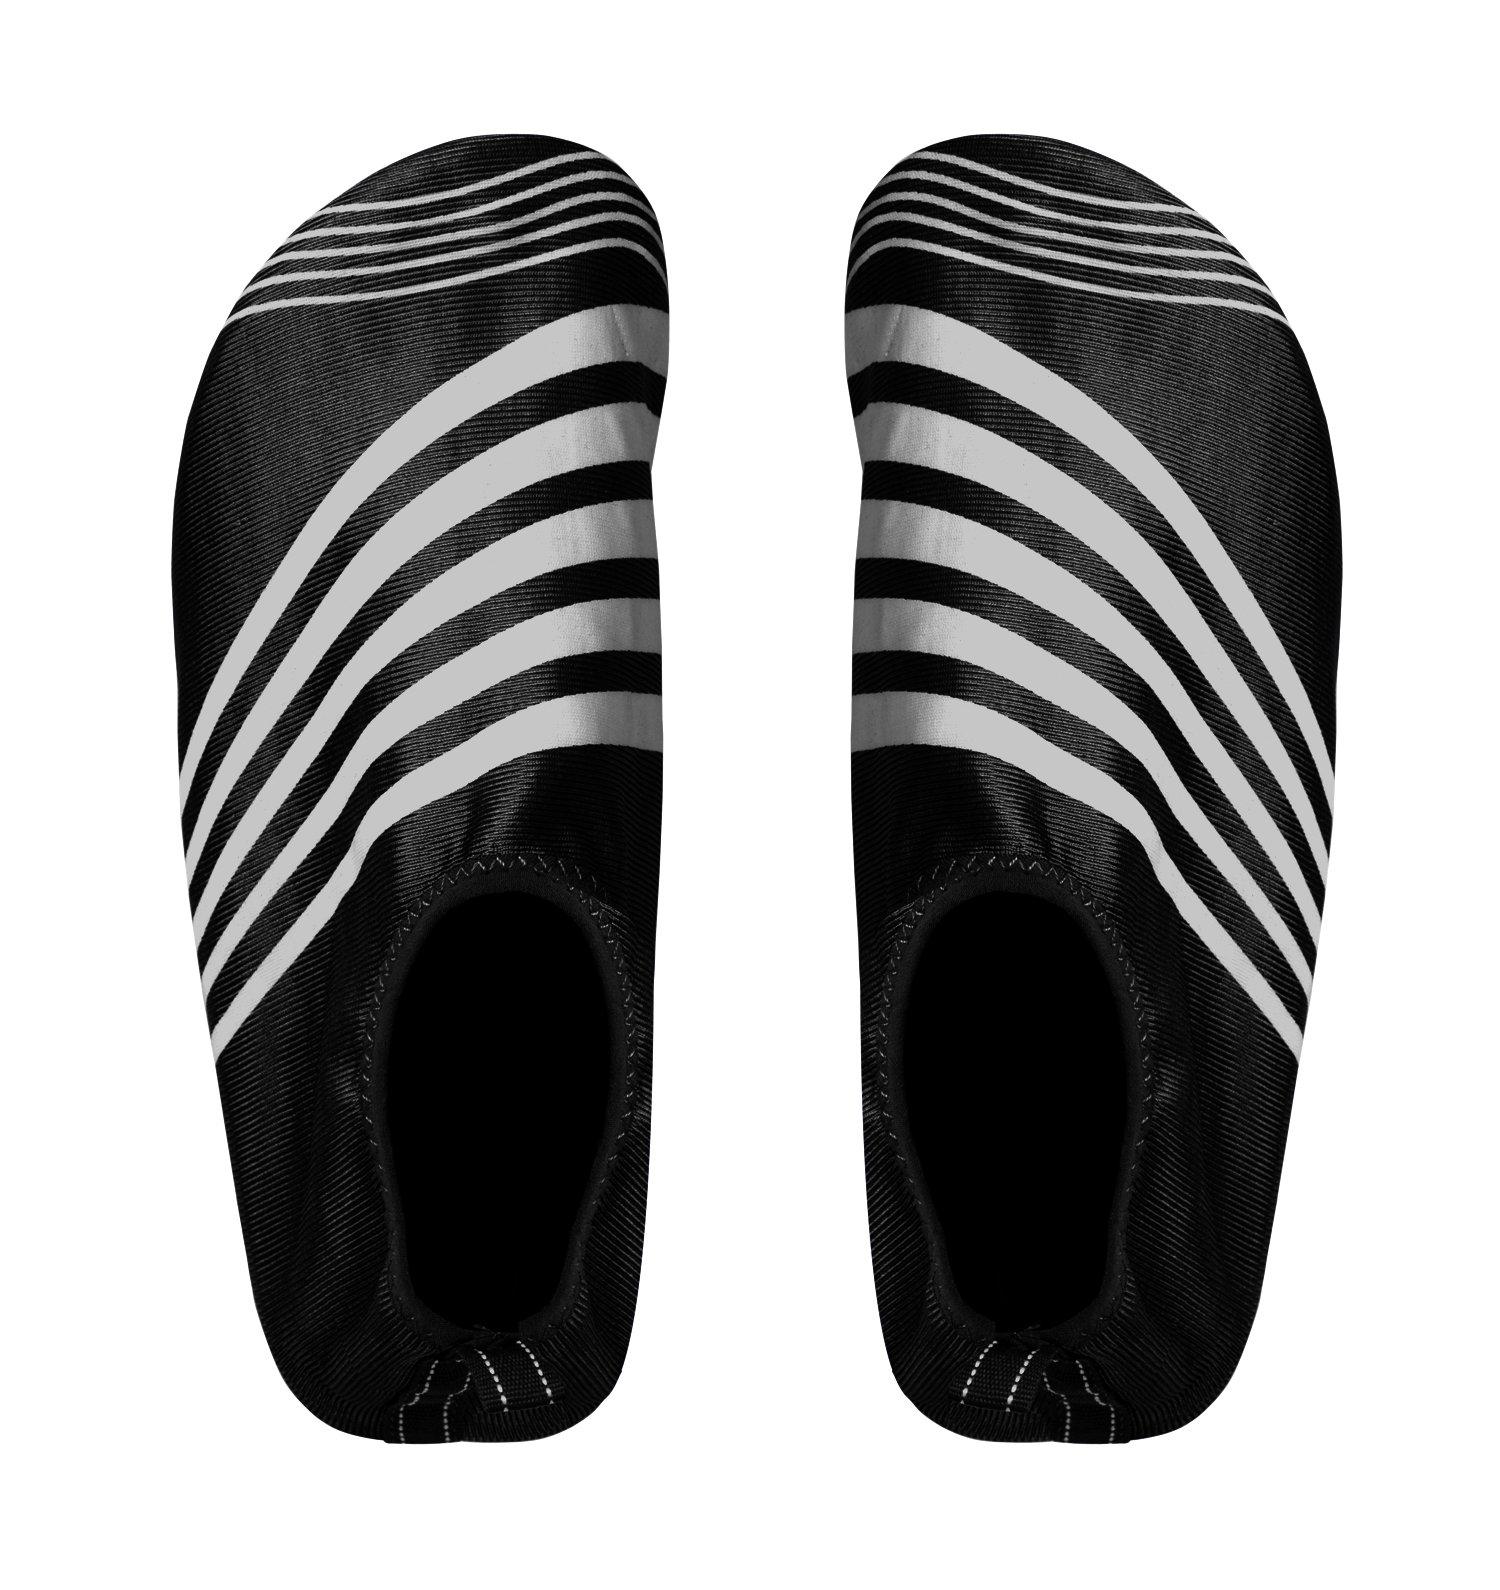 Peach Couture Mens Athletic Water Shoes Slip on Quick Drying Aqua Socks (Medium, Black Grey)